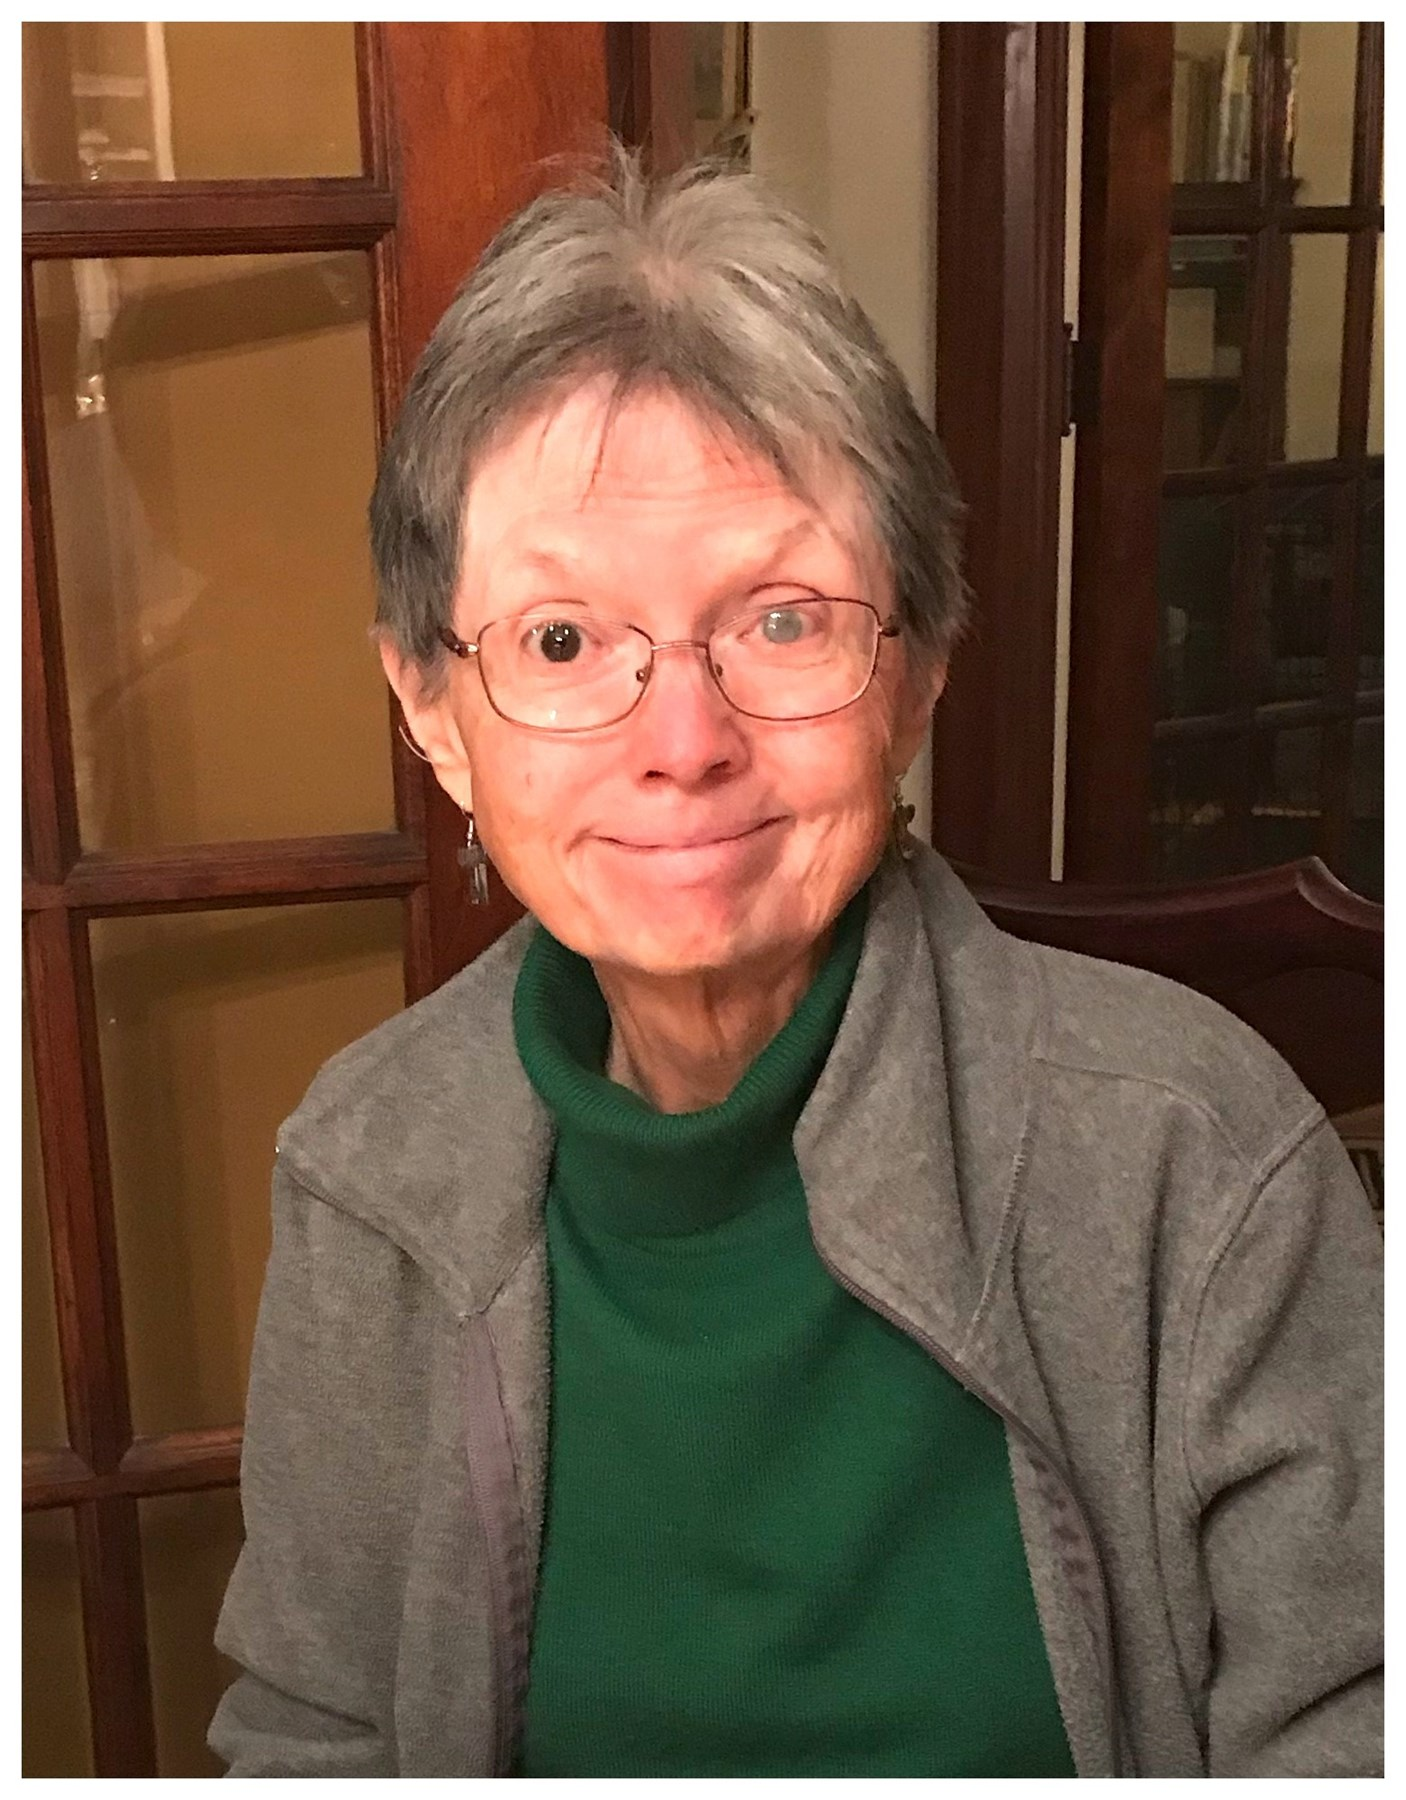 Louisa Plumb Pieper Obituary - Ann Arbor, MI